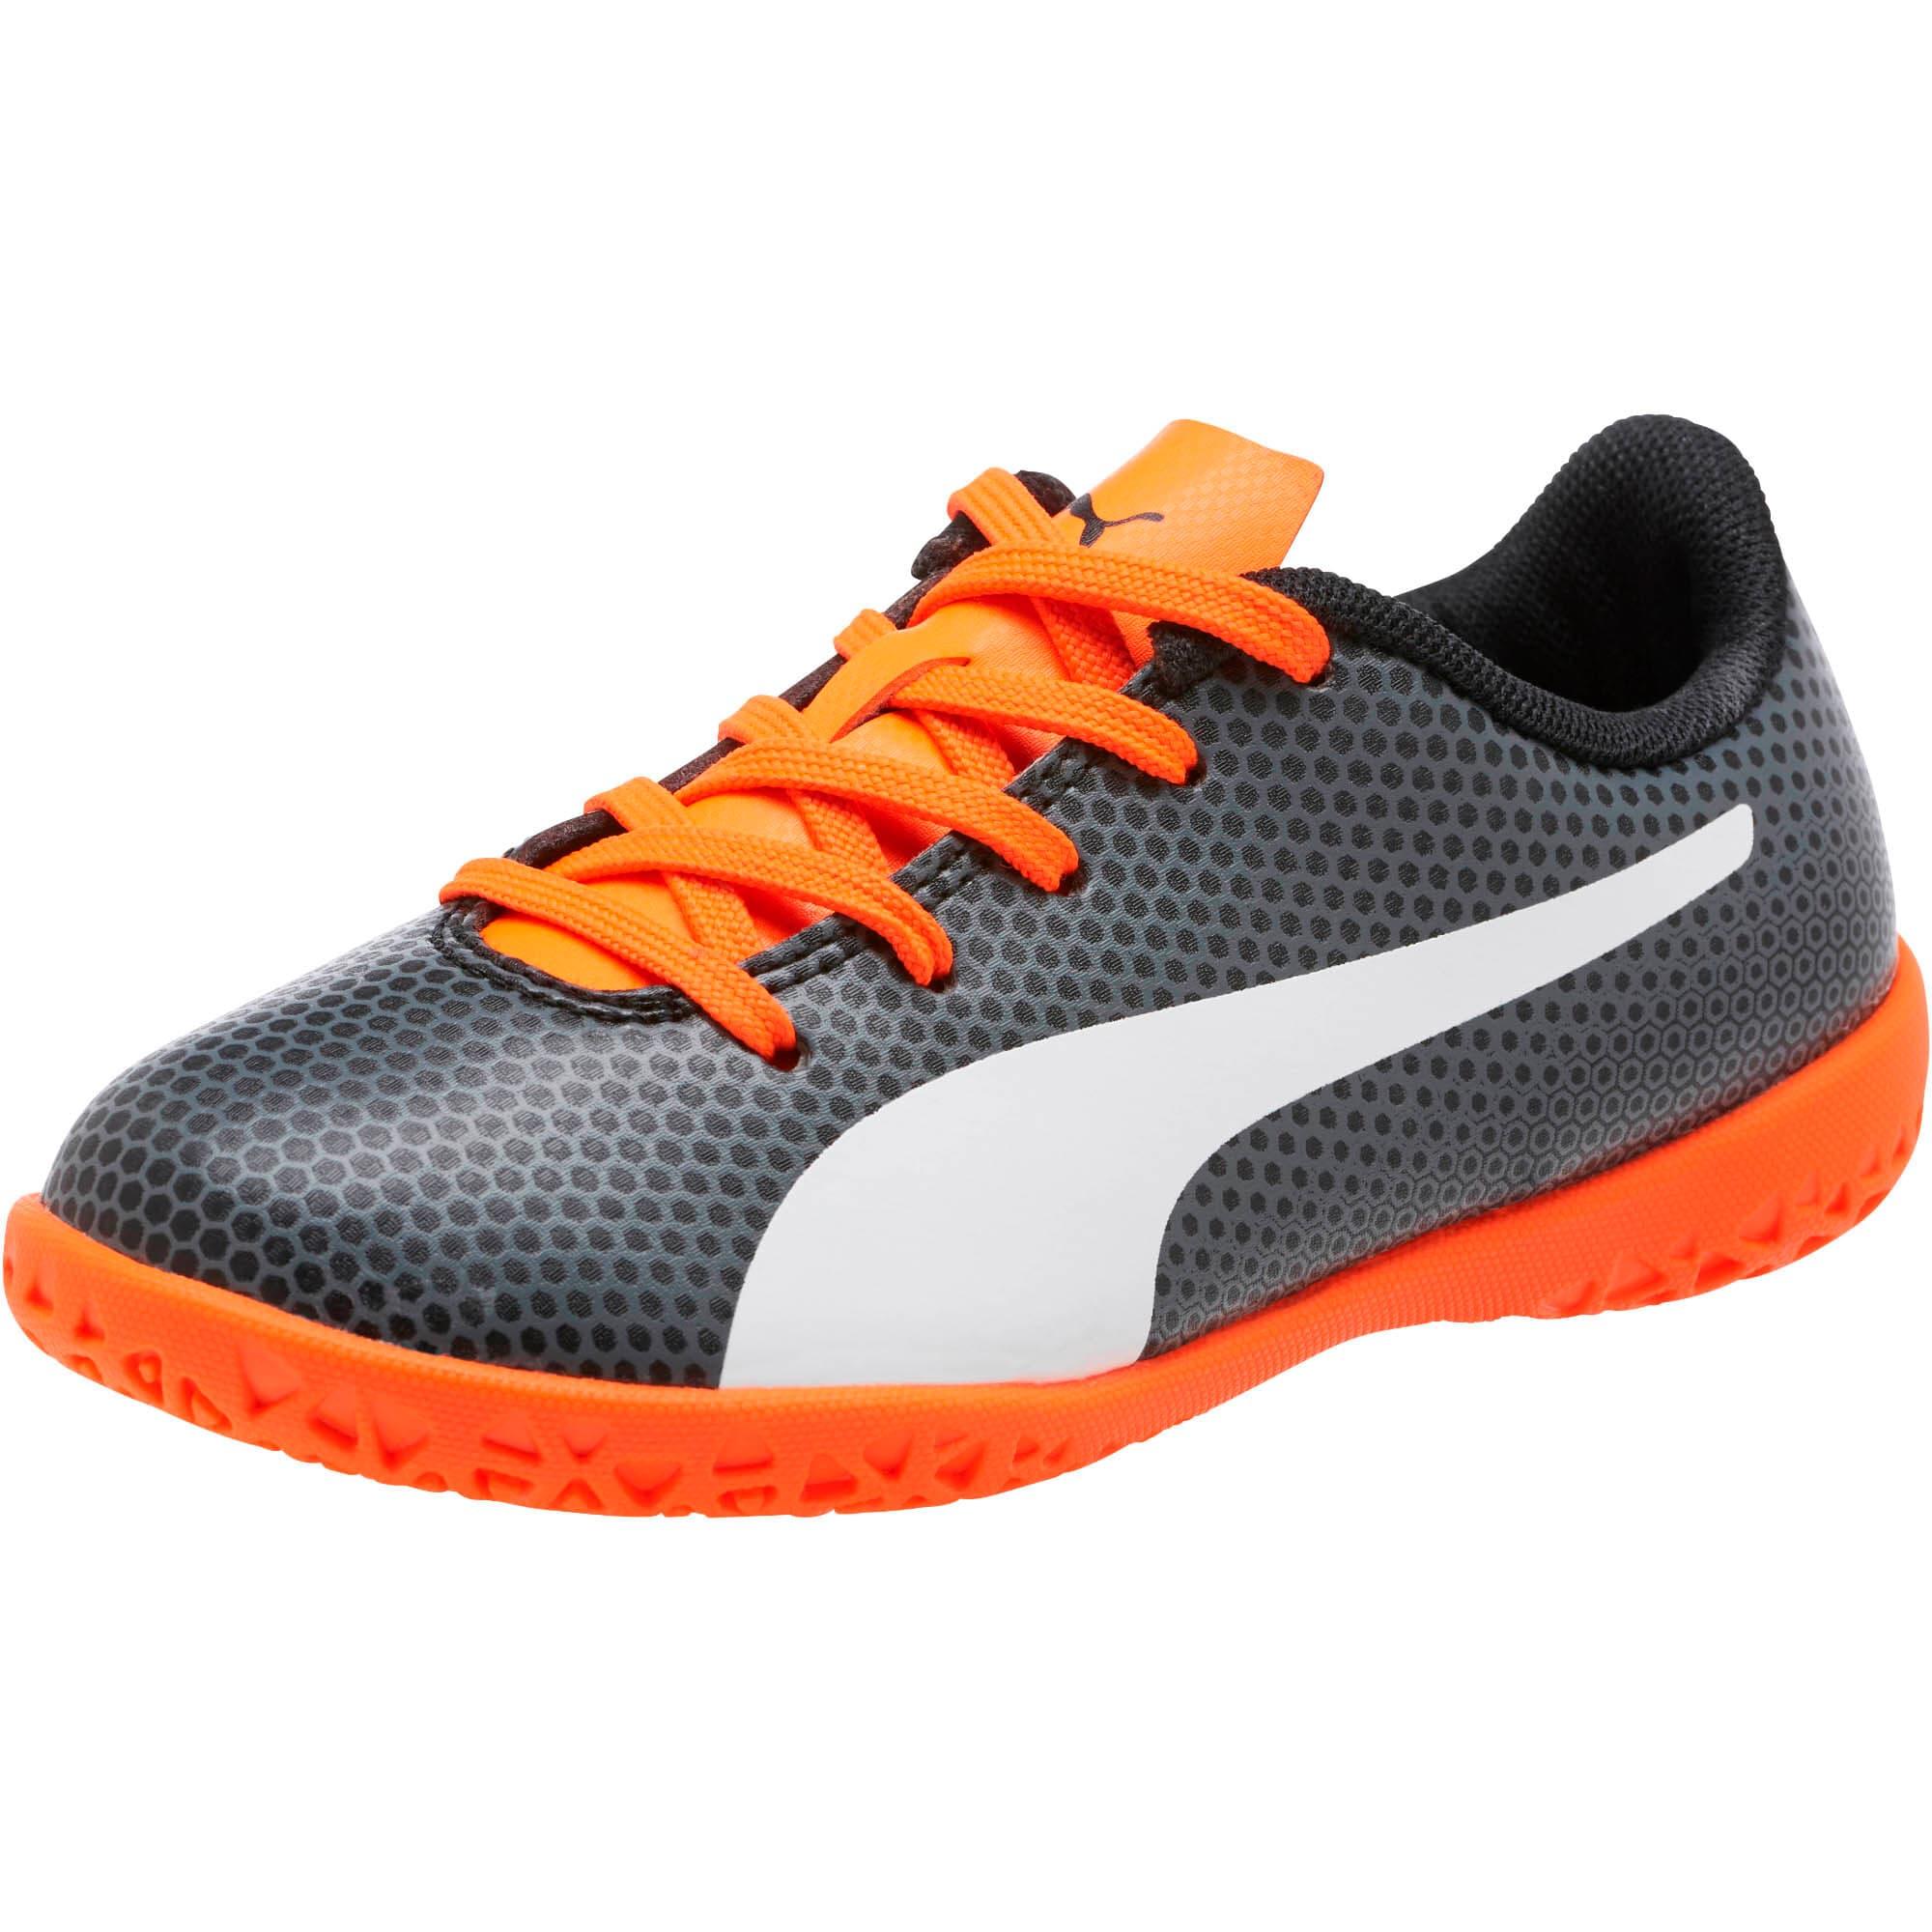 Thumbnail 1 of PUMA Spirit IT Soccer Shoes JR, Black-White-Orange, medium